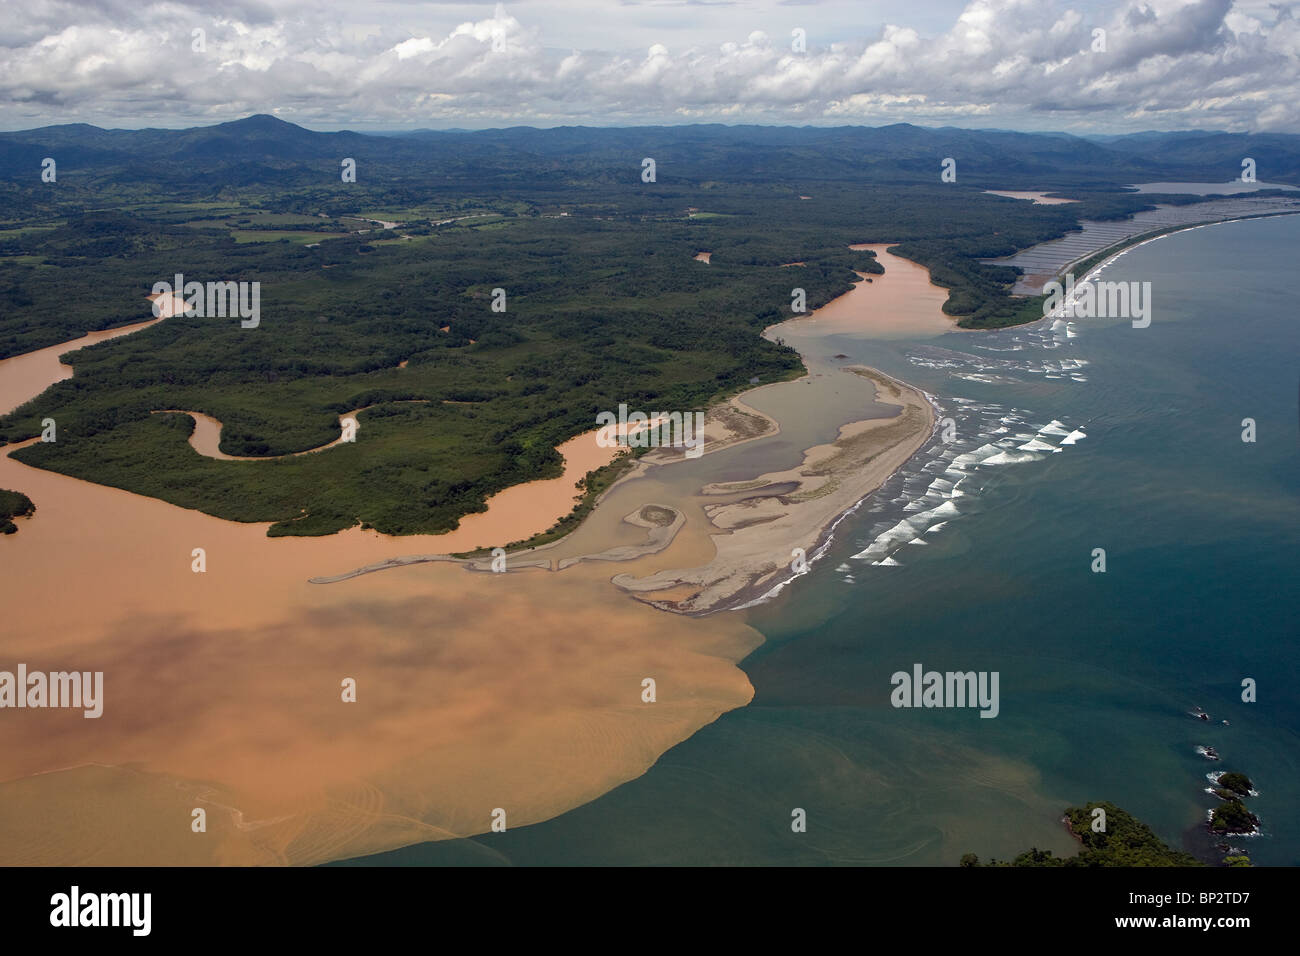 Luftaufnahme über dem Sediment gefüllt schlammigen Fluss fließt in Pazifik Republik Panama Stockbild